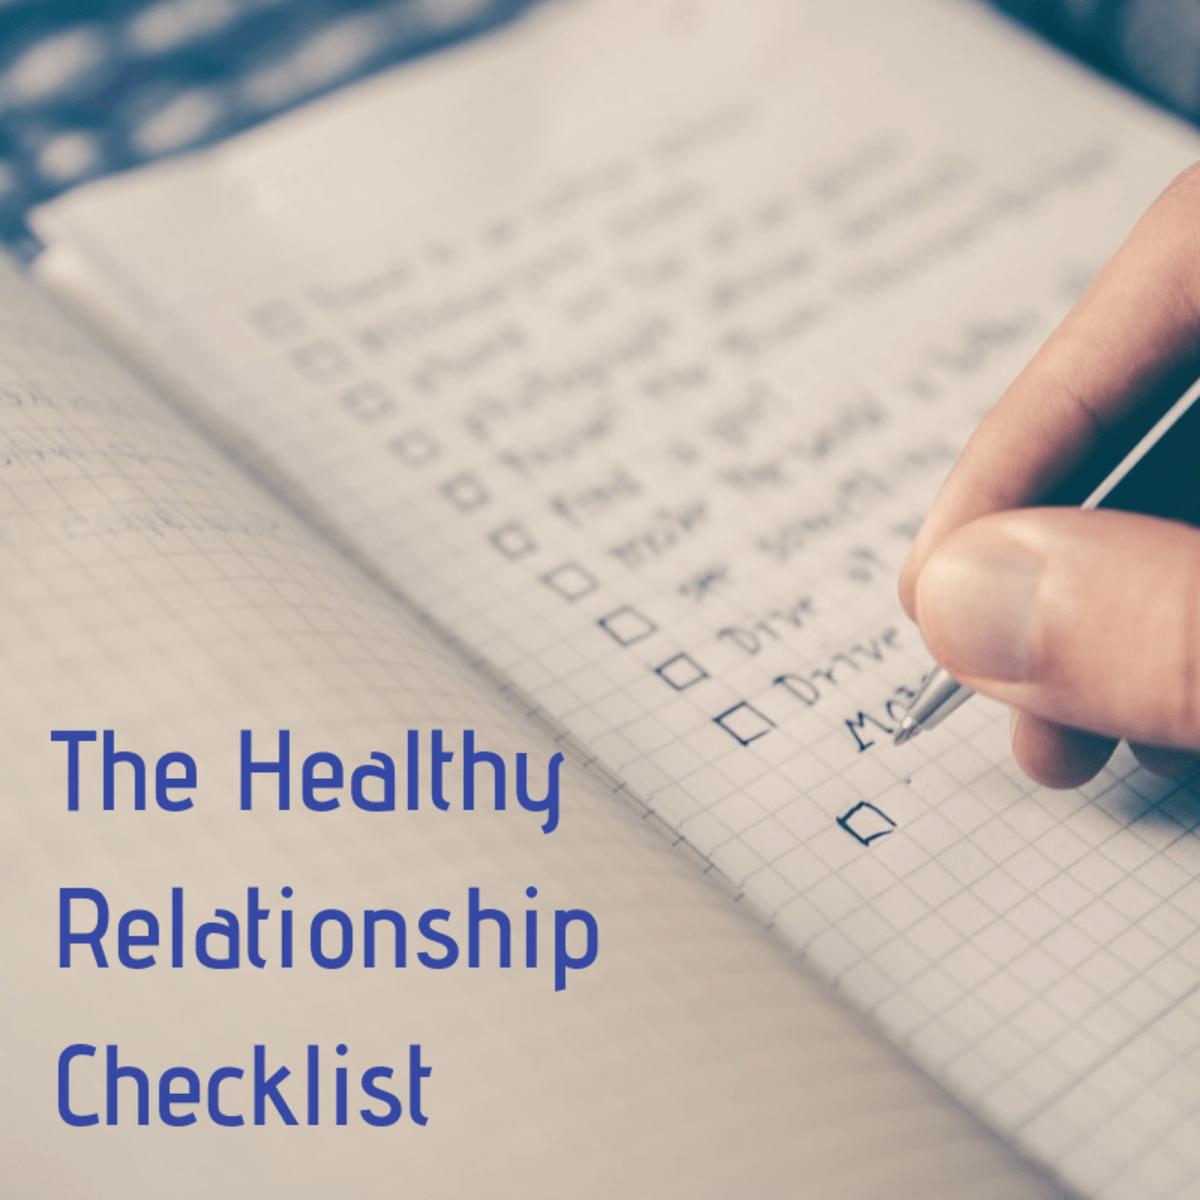 Should I Go or Should I Stay? The Ultimate Relationship Checklist